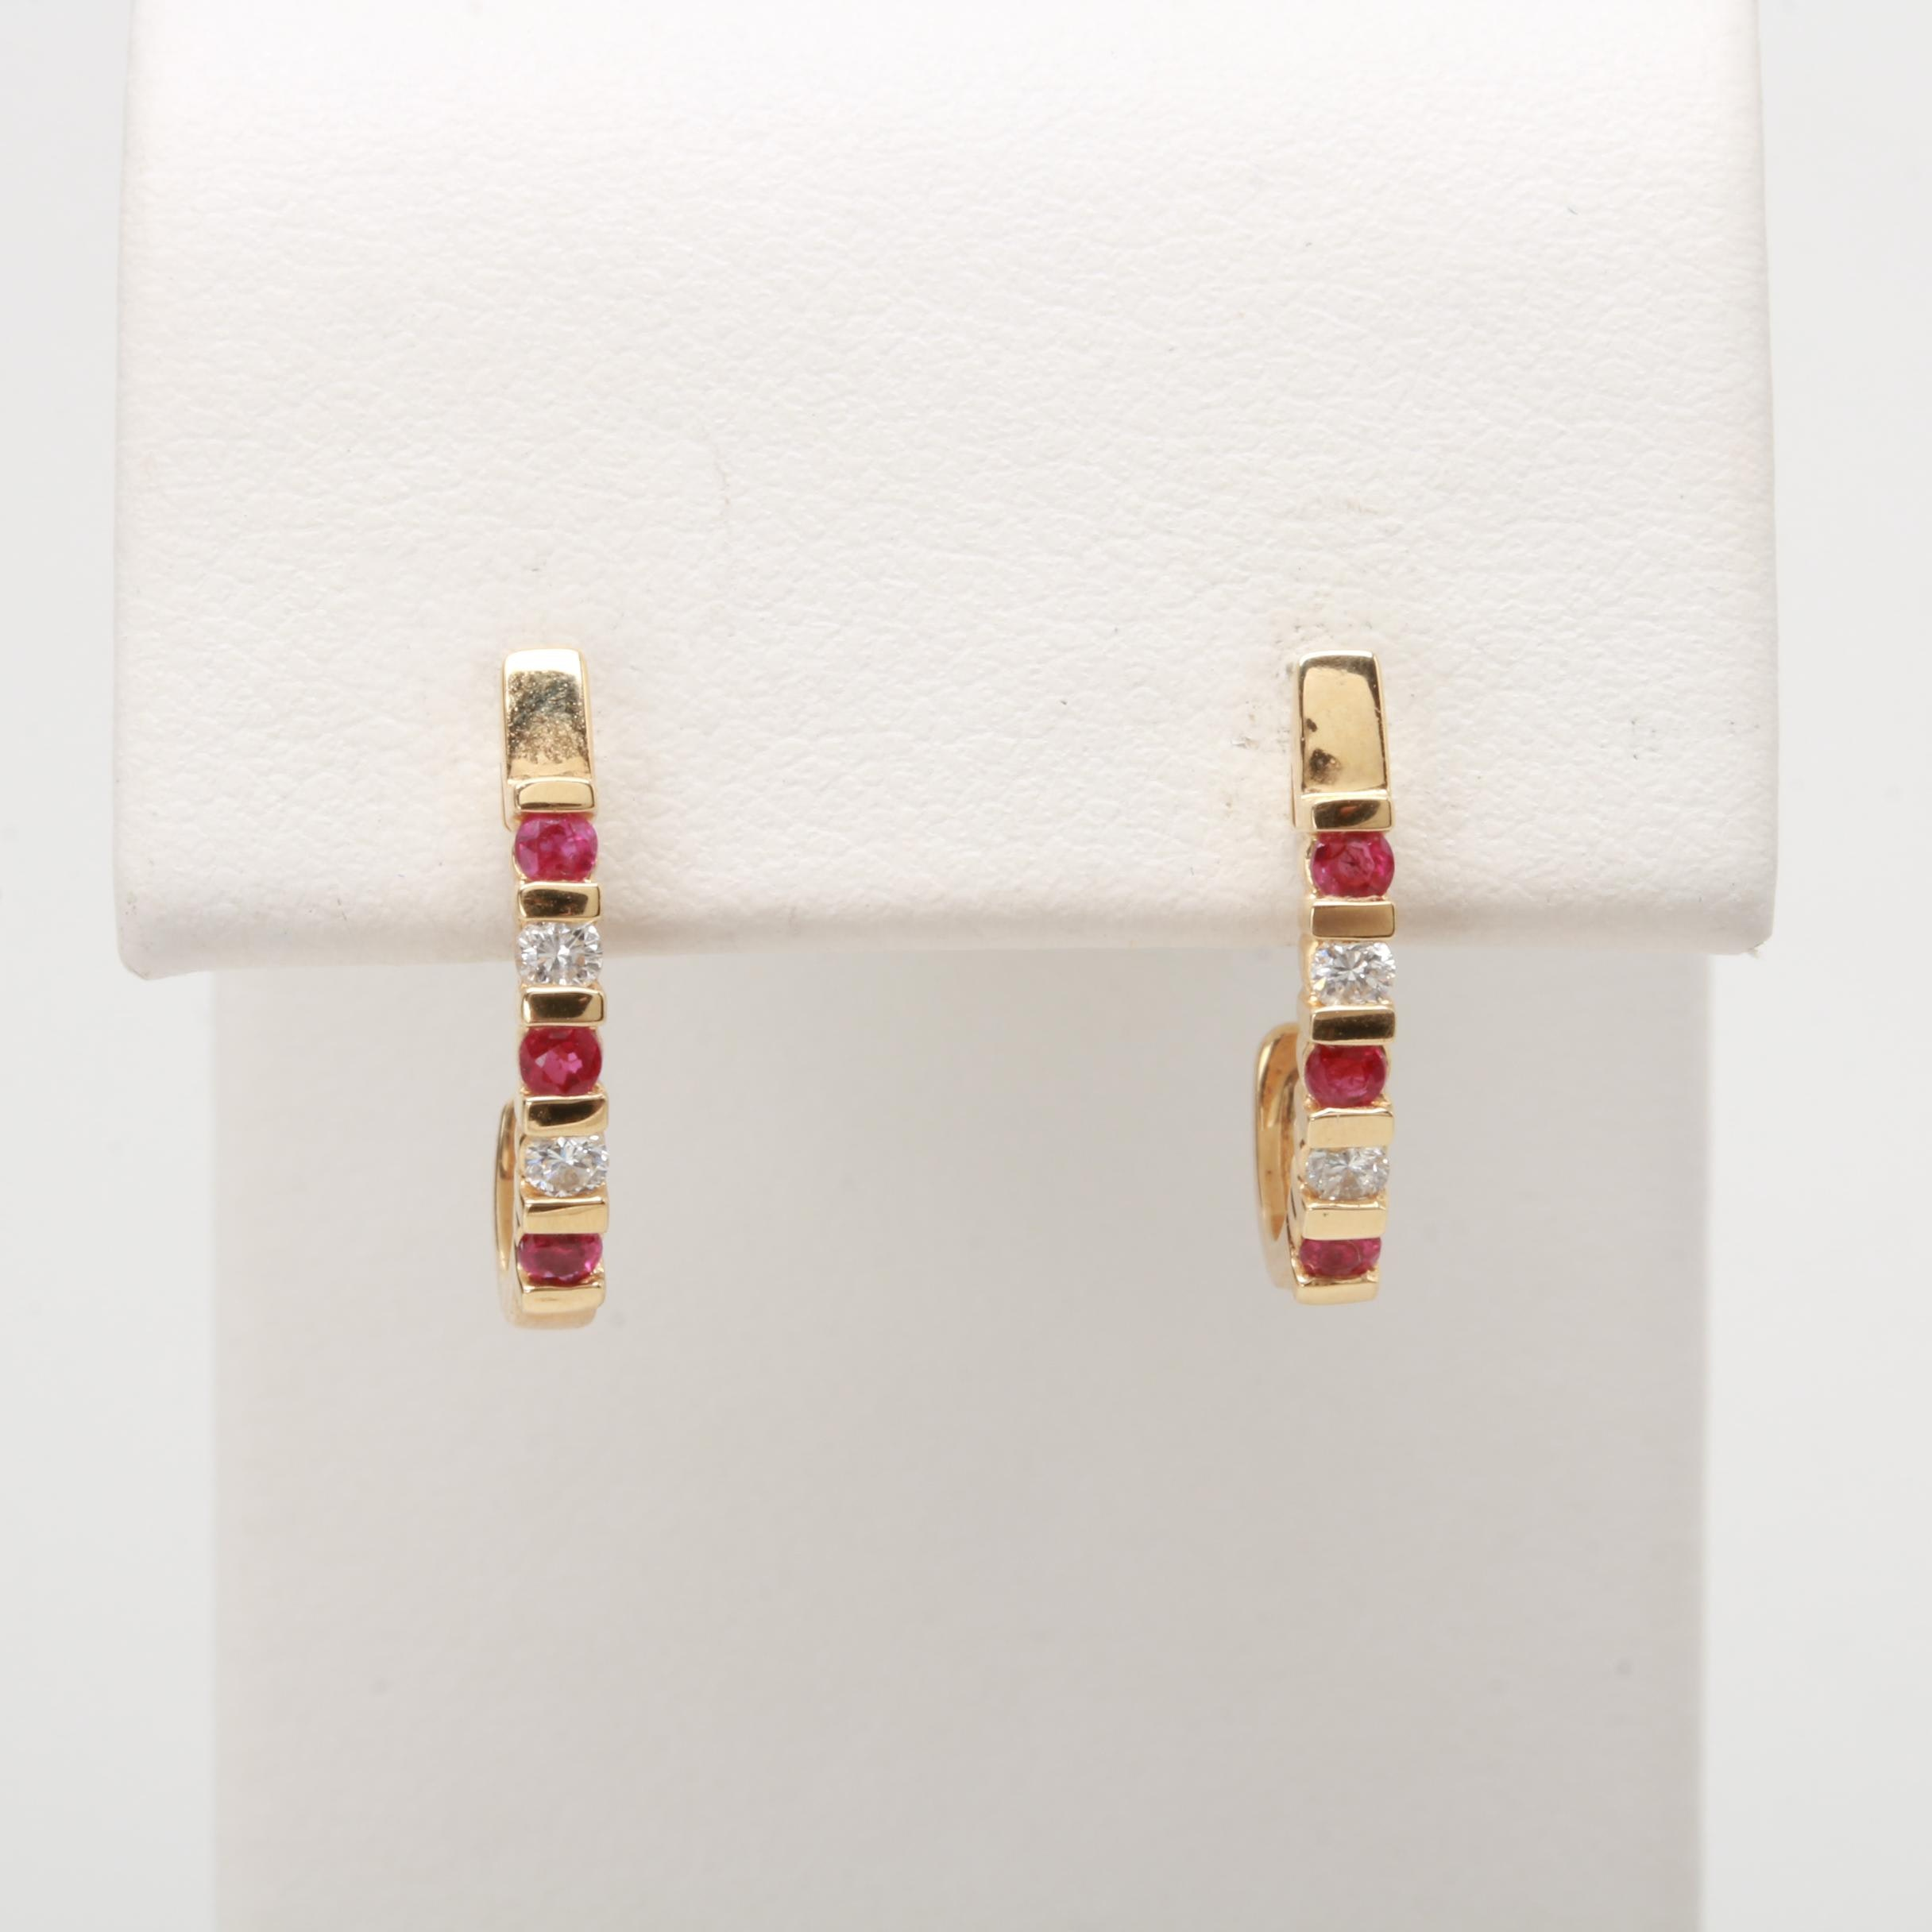 14K Yellow Gold Diamond and Ruby J-Hoop Earrings